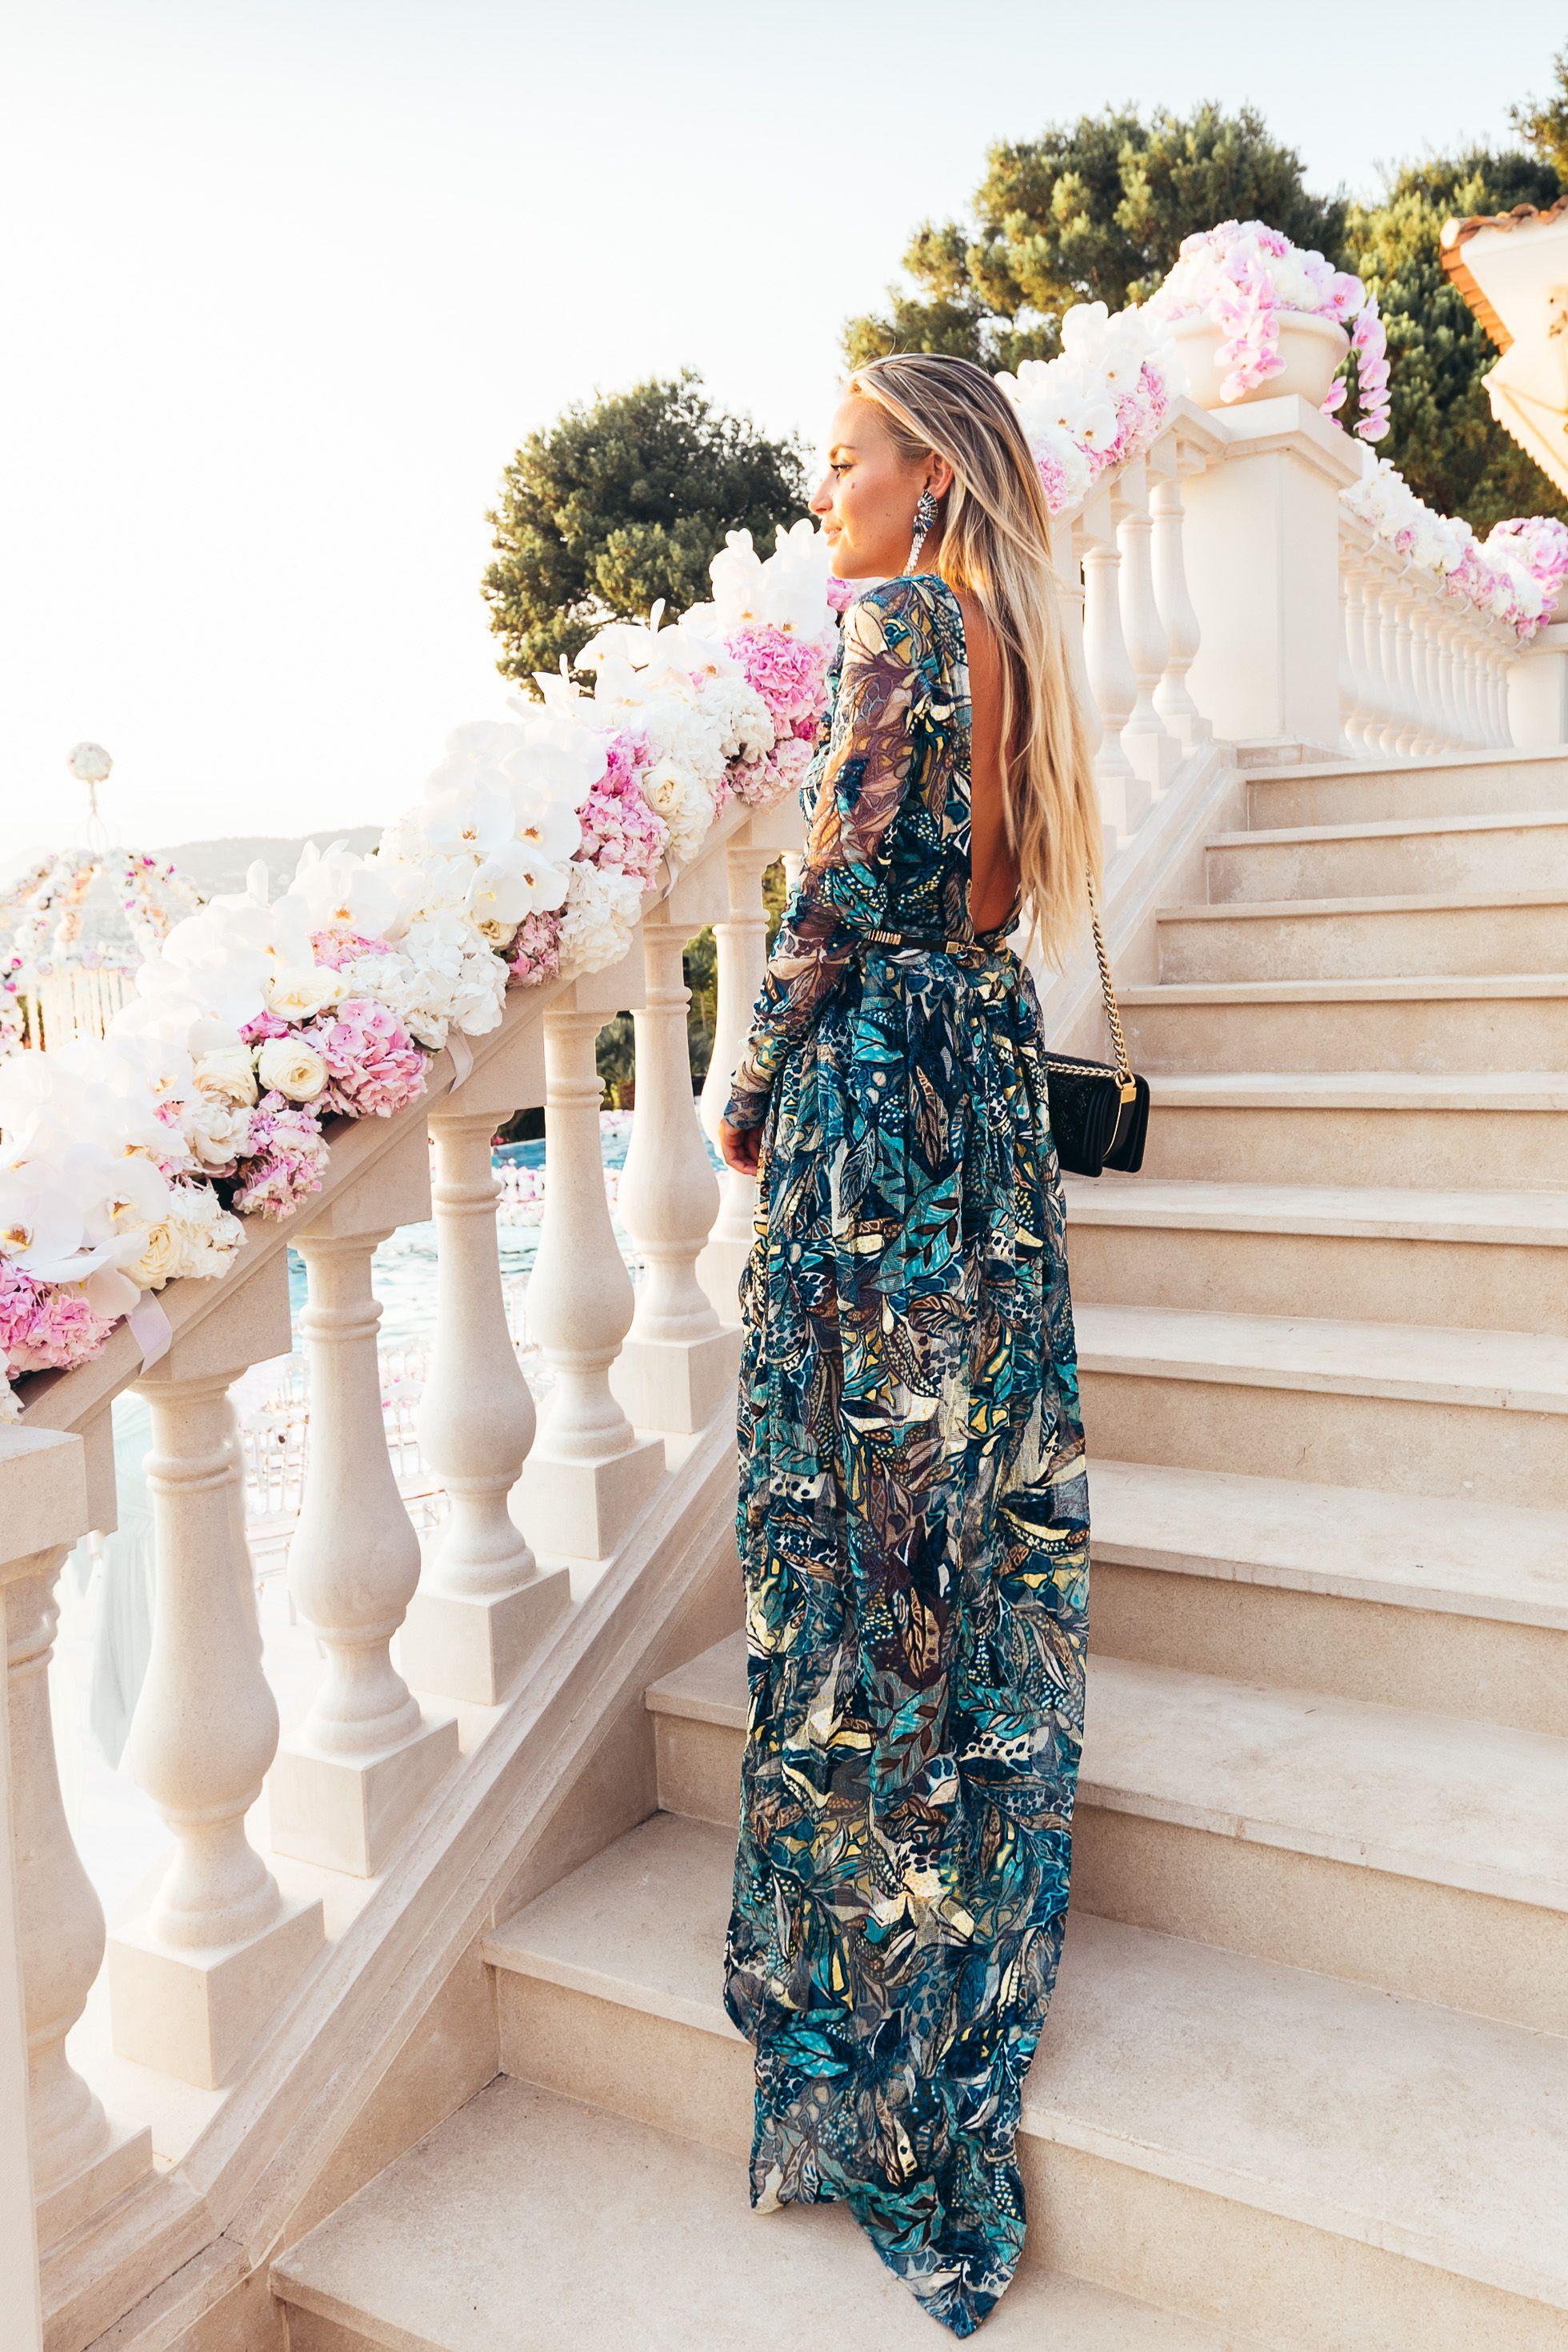 e3c46c981172 janni-deler-wedding-lookJ1130317-Redigera | shoes | Giuseppe zanotti ...